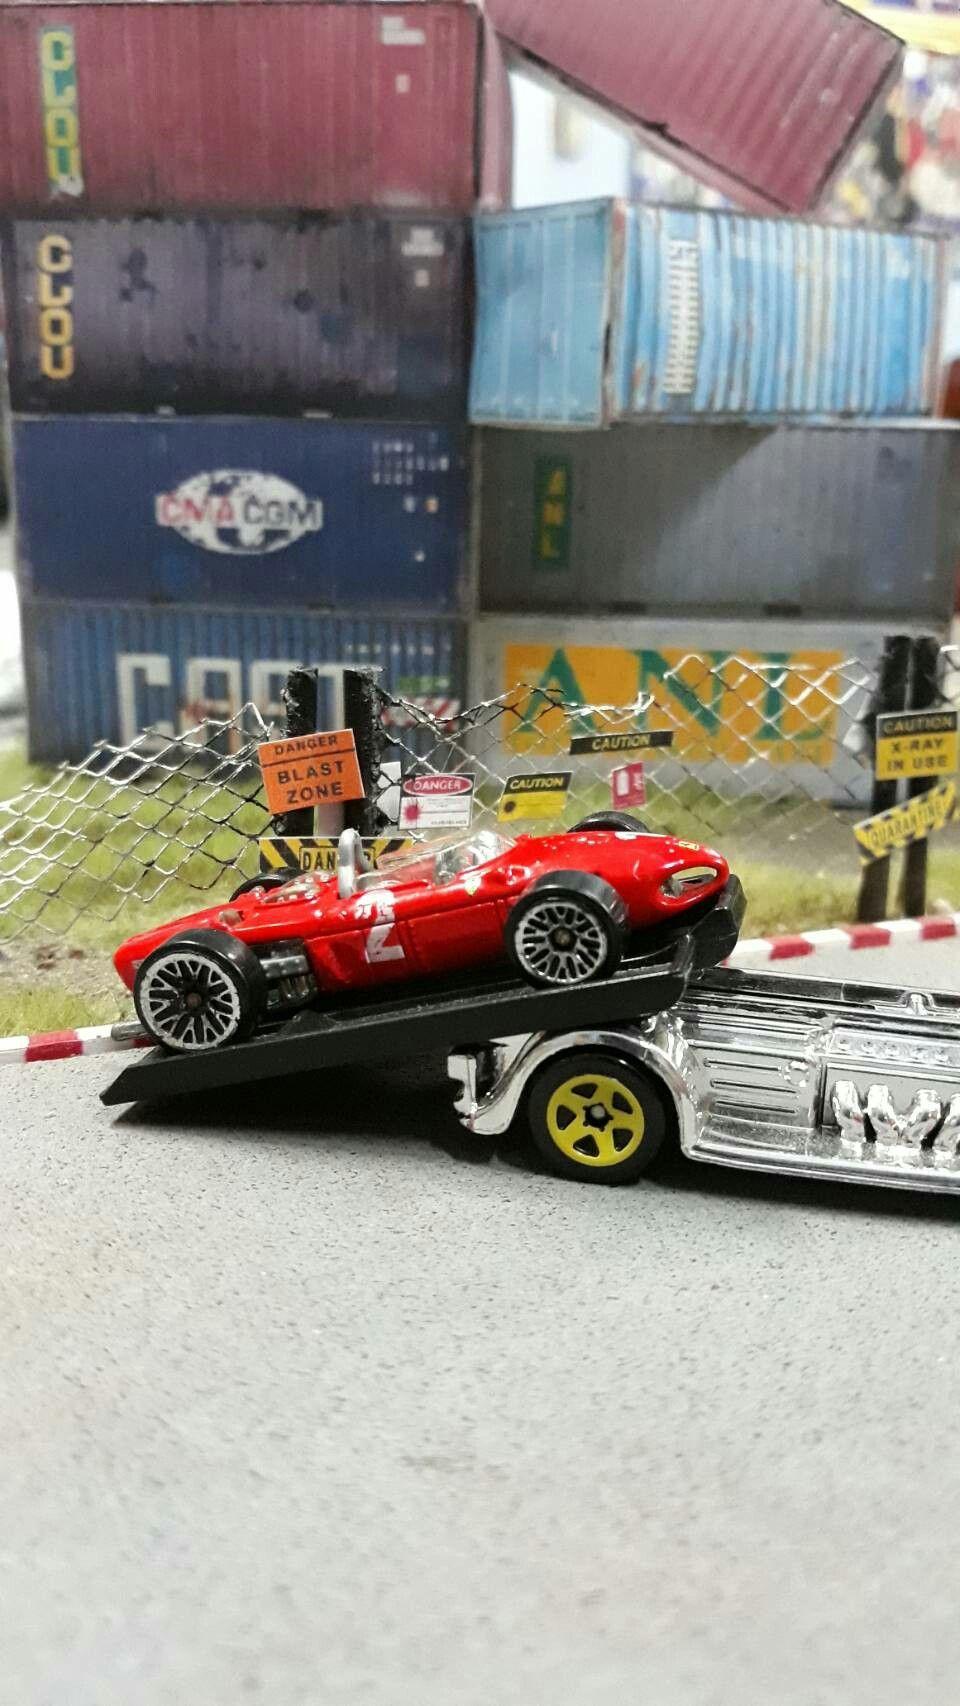 Ferrari 156 old racing cars   hot wheels   Pinterest   Ferrari